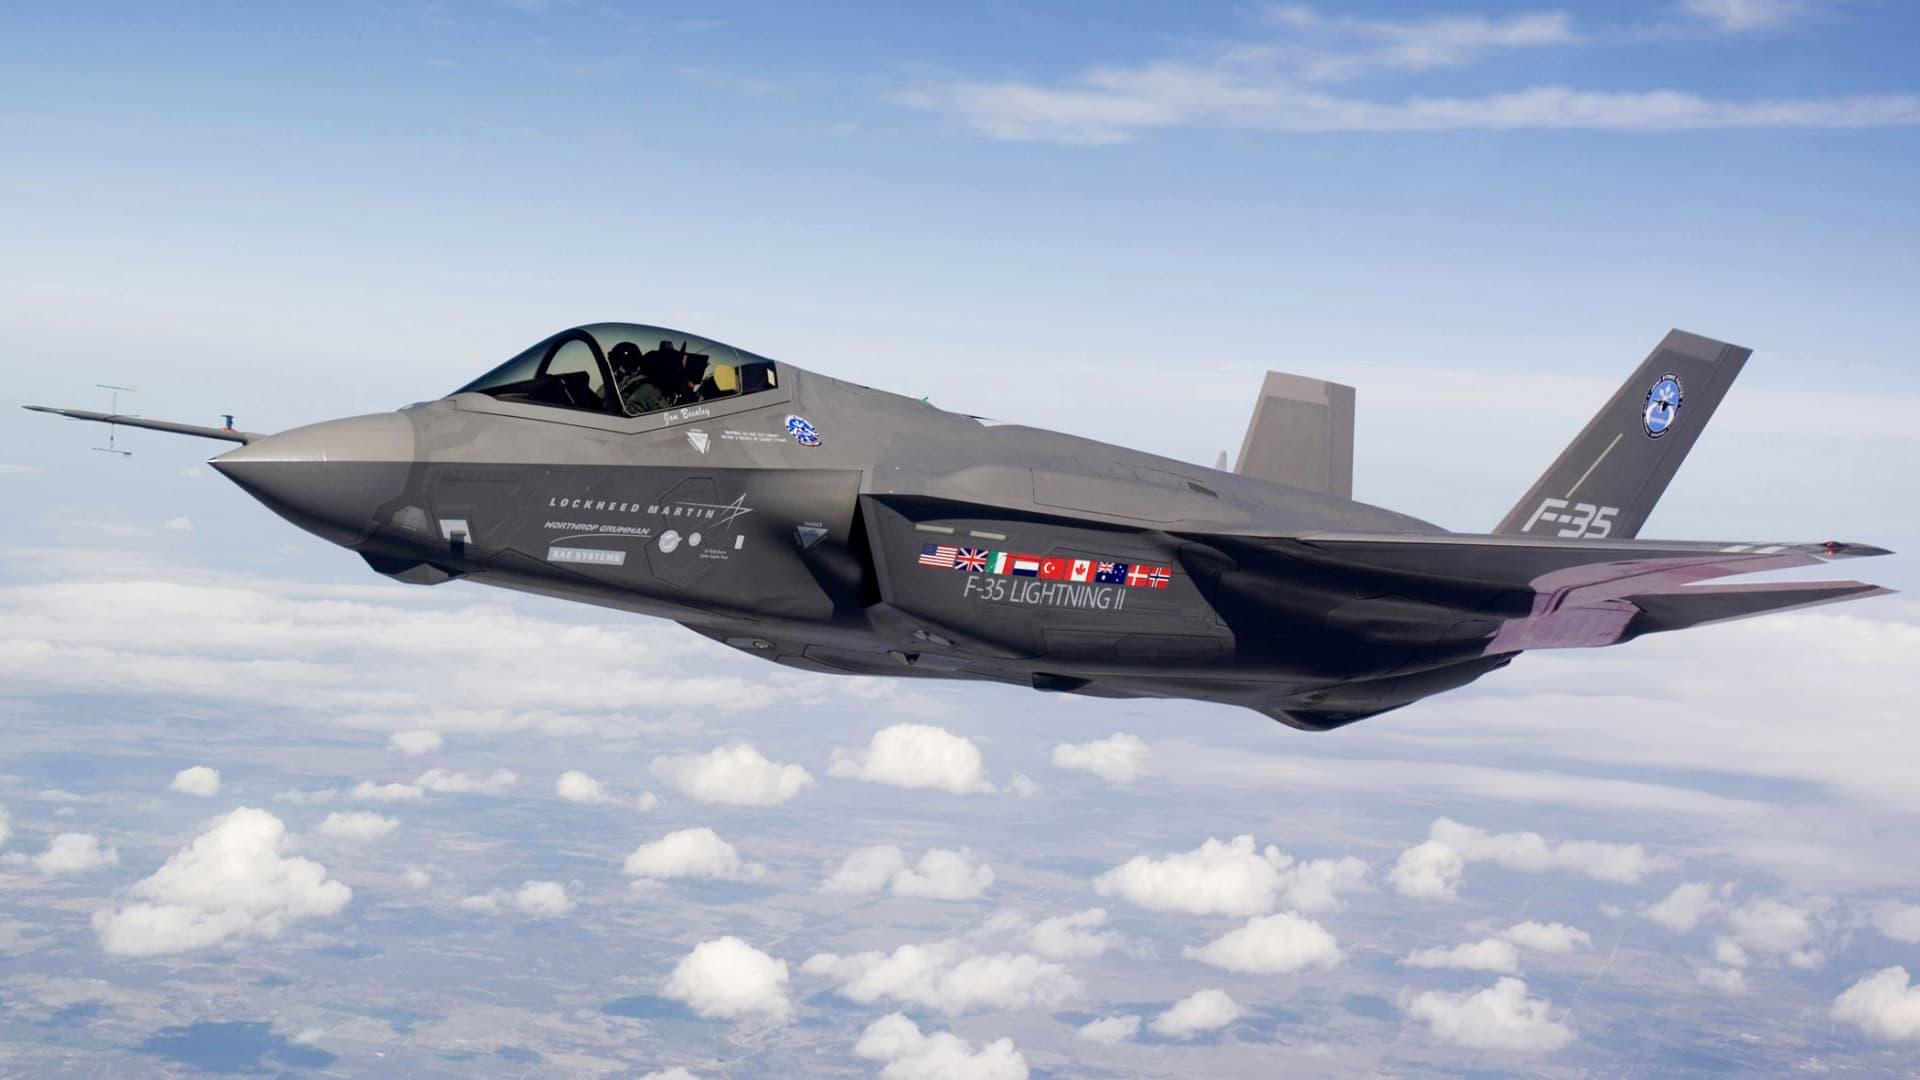 Lockheed Martin F-35 Joint Strike Fighter Lightning II